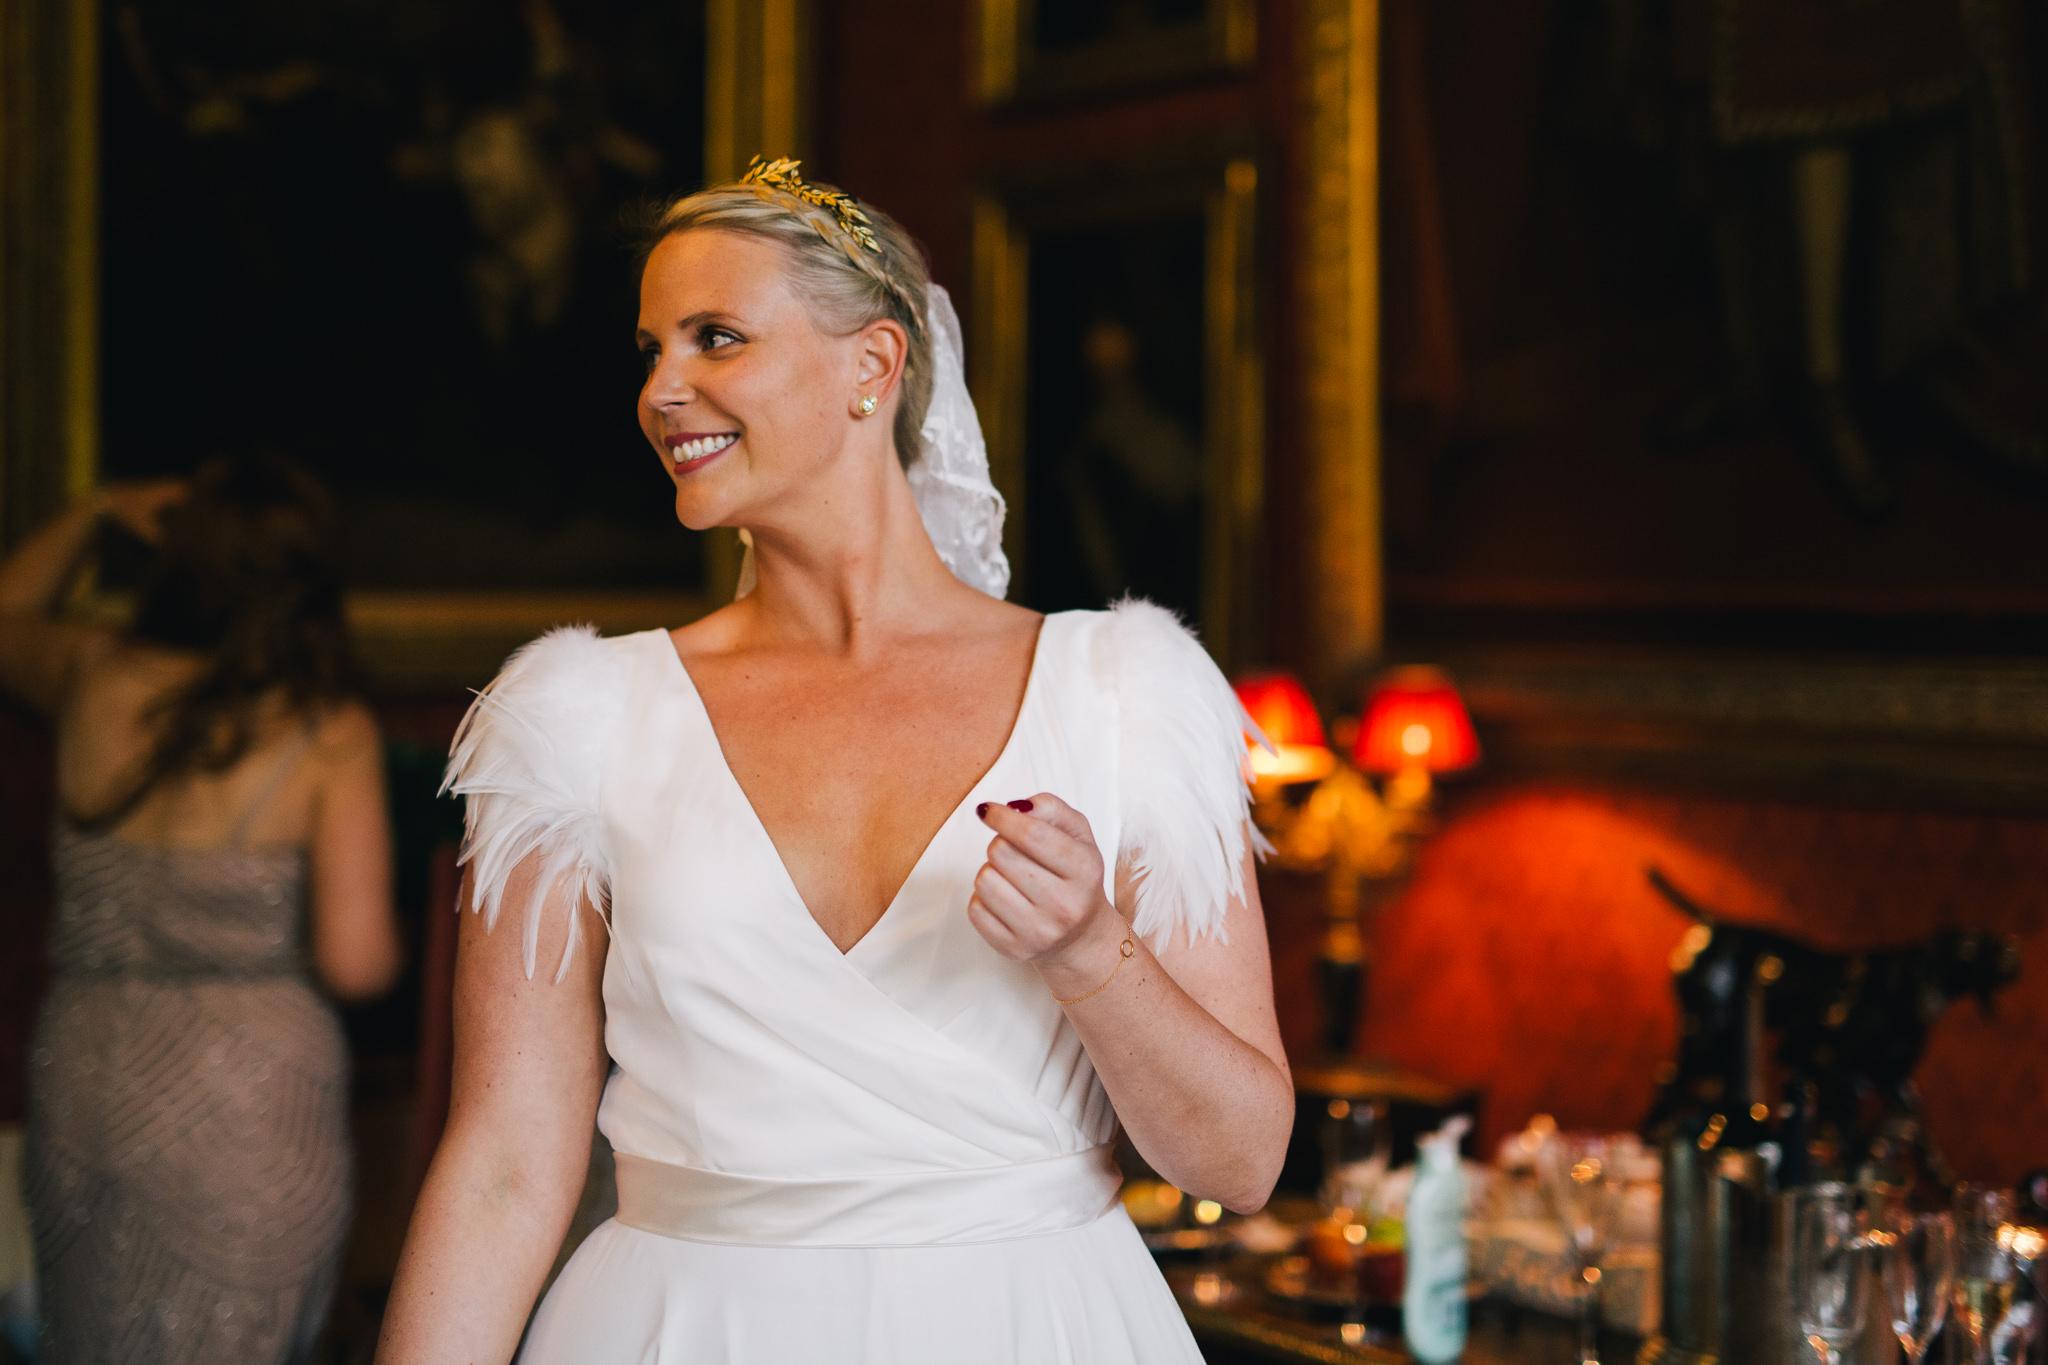 Beautiful bride Rebecca wore a wedding dress by Halfpenny London